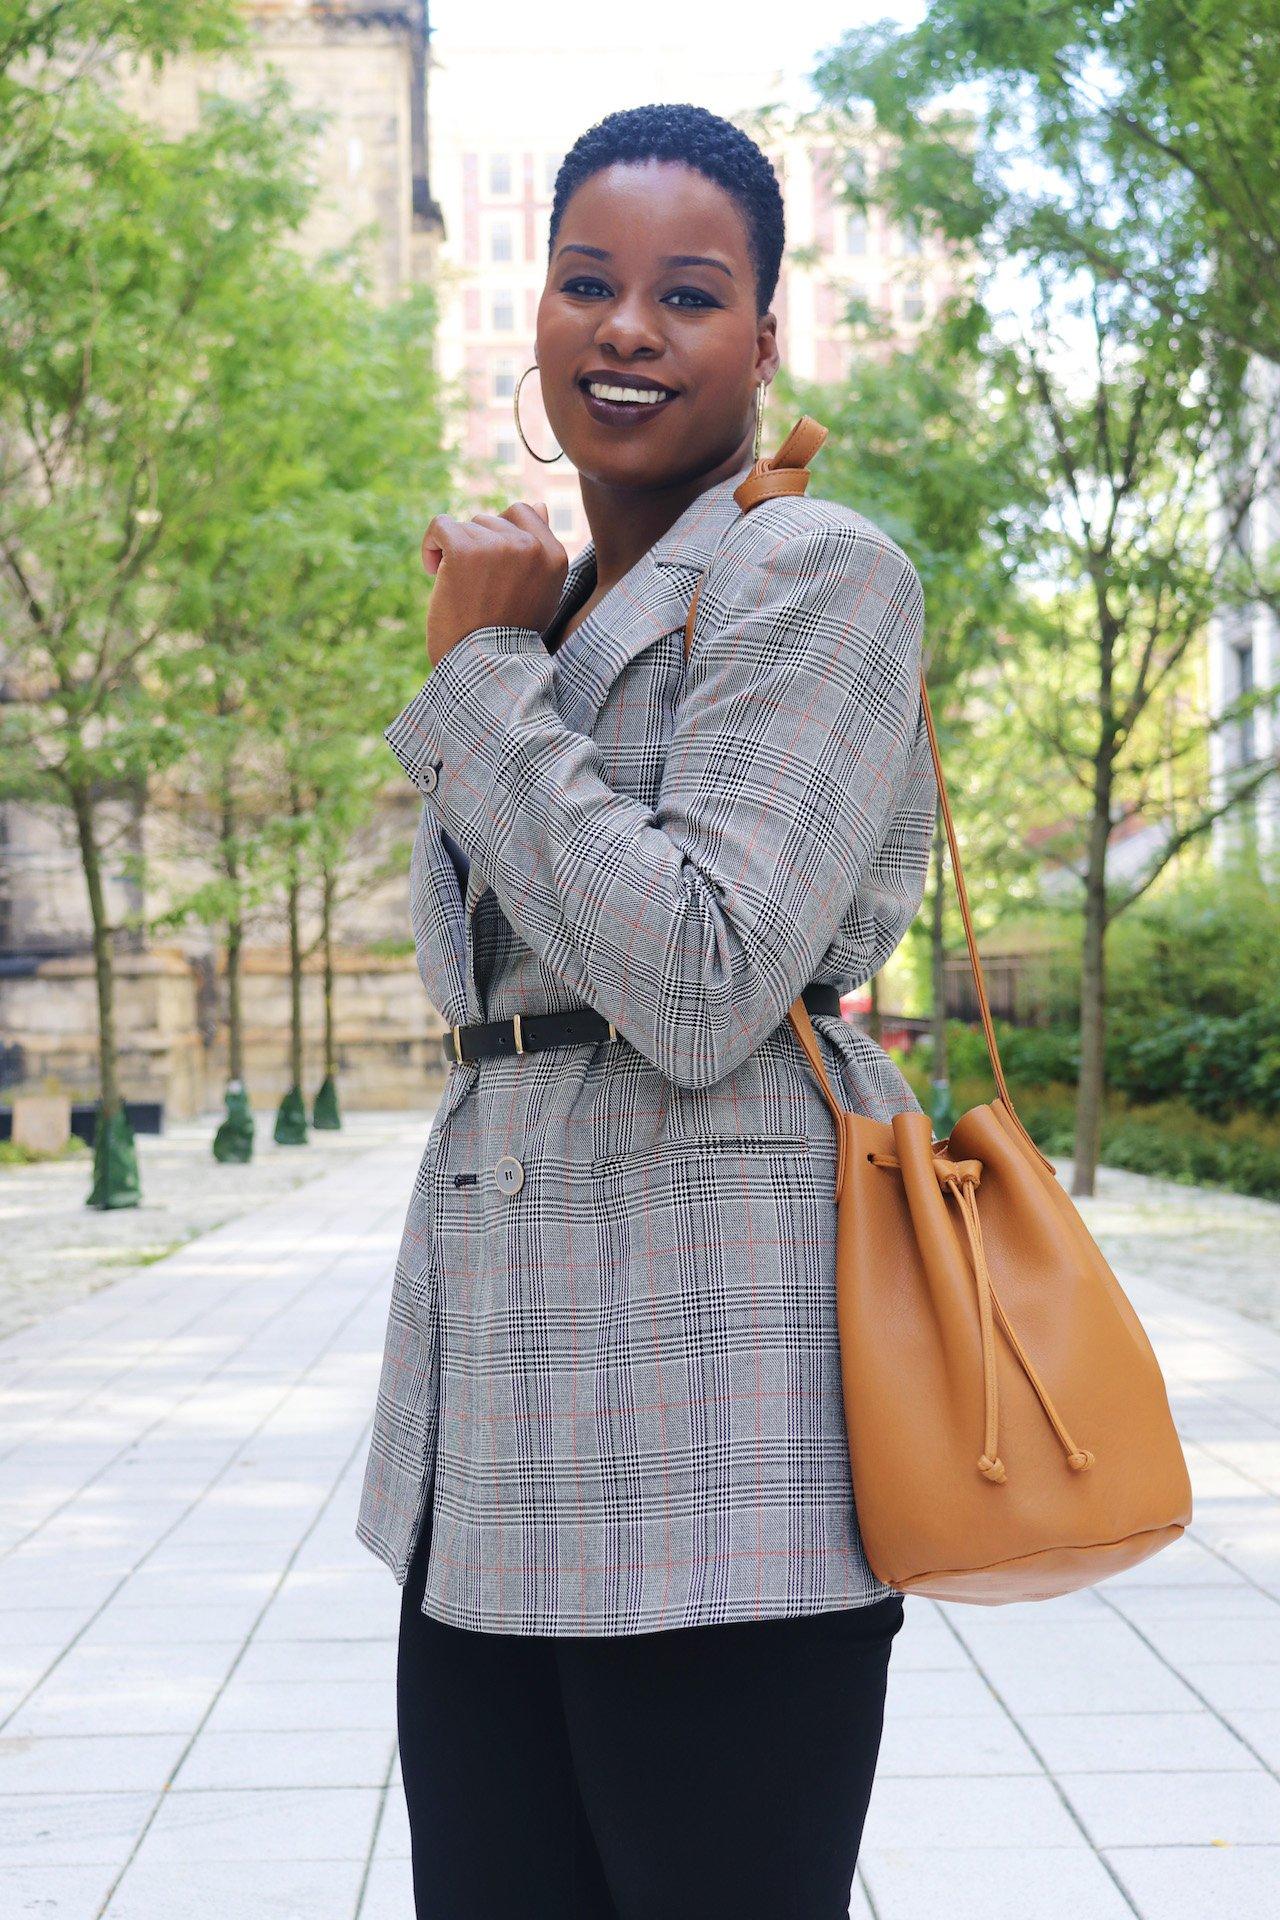 Drawstring Bag Trend Baggu Leather Bucket Bag